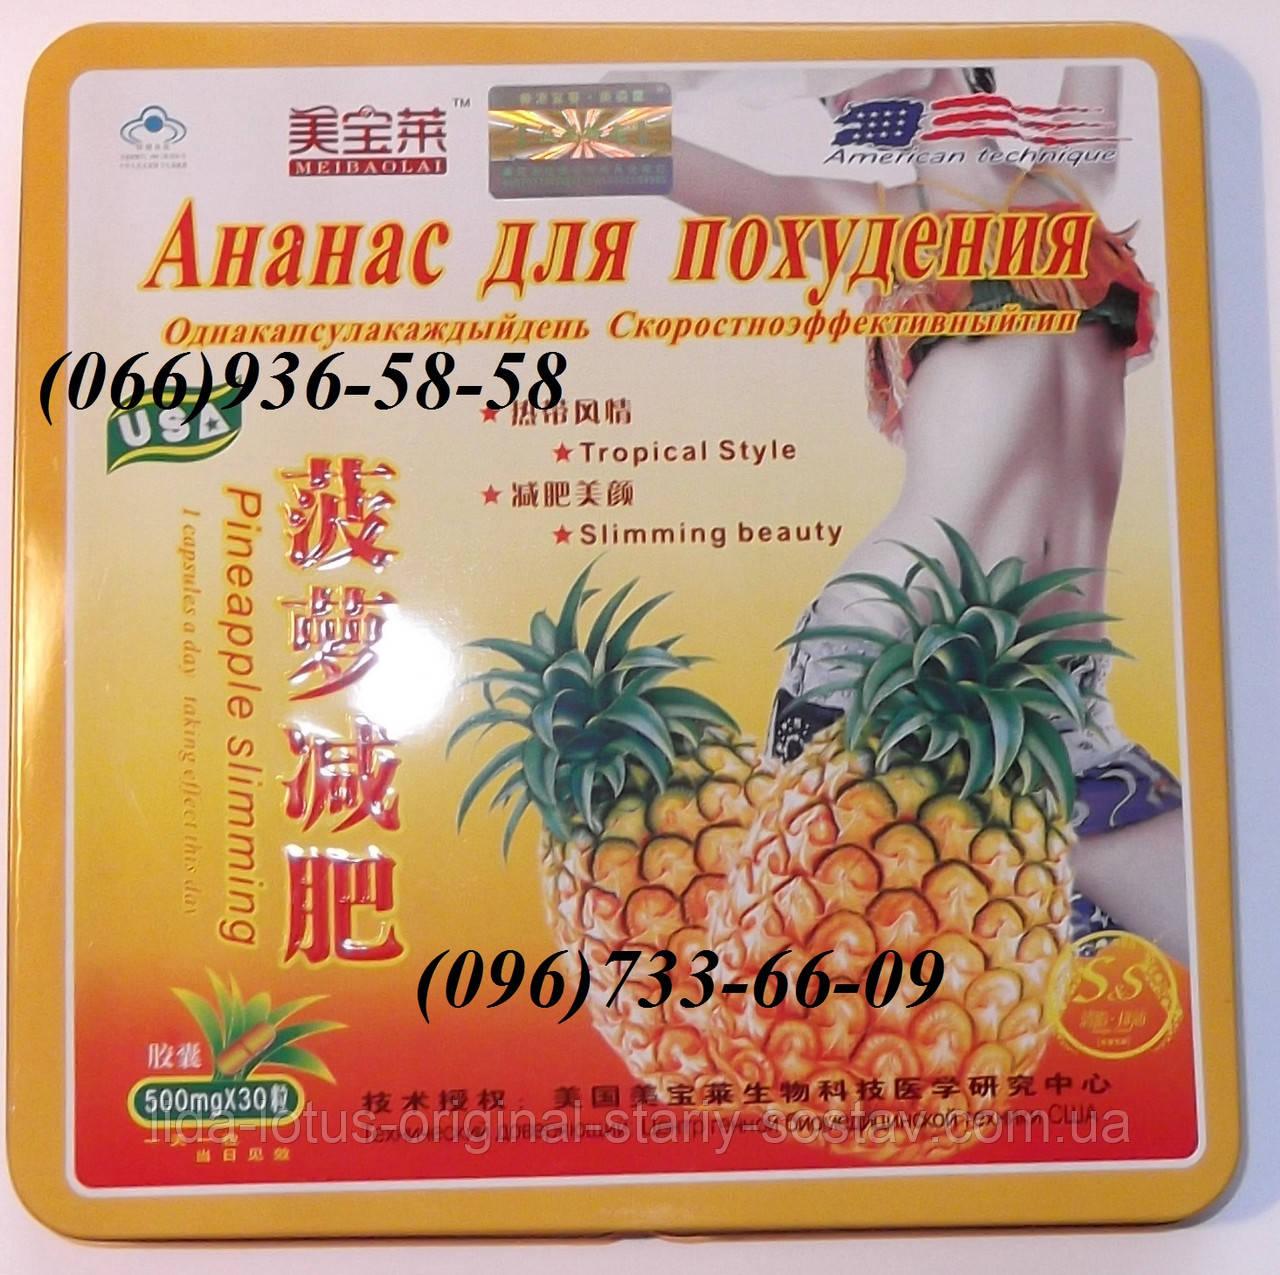 Himalayan Lotus таблетки для похудения